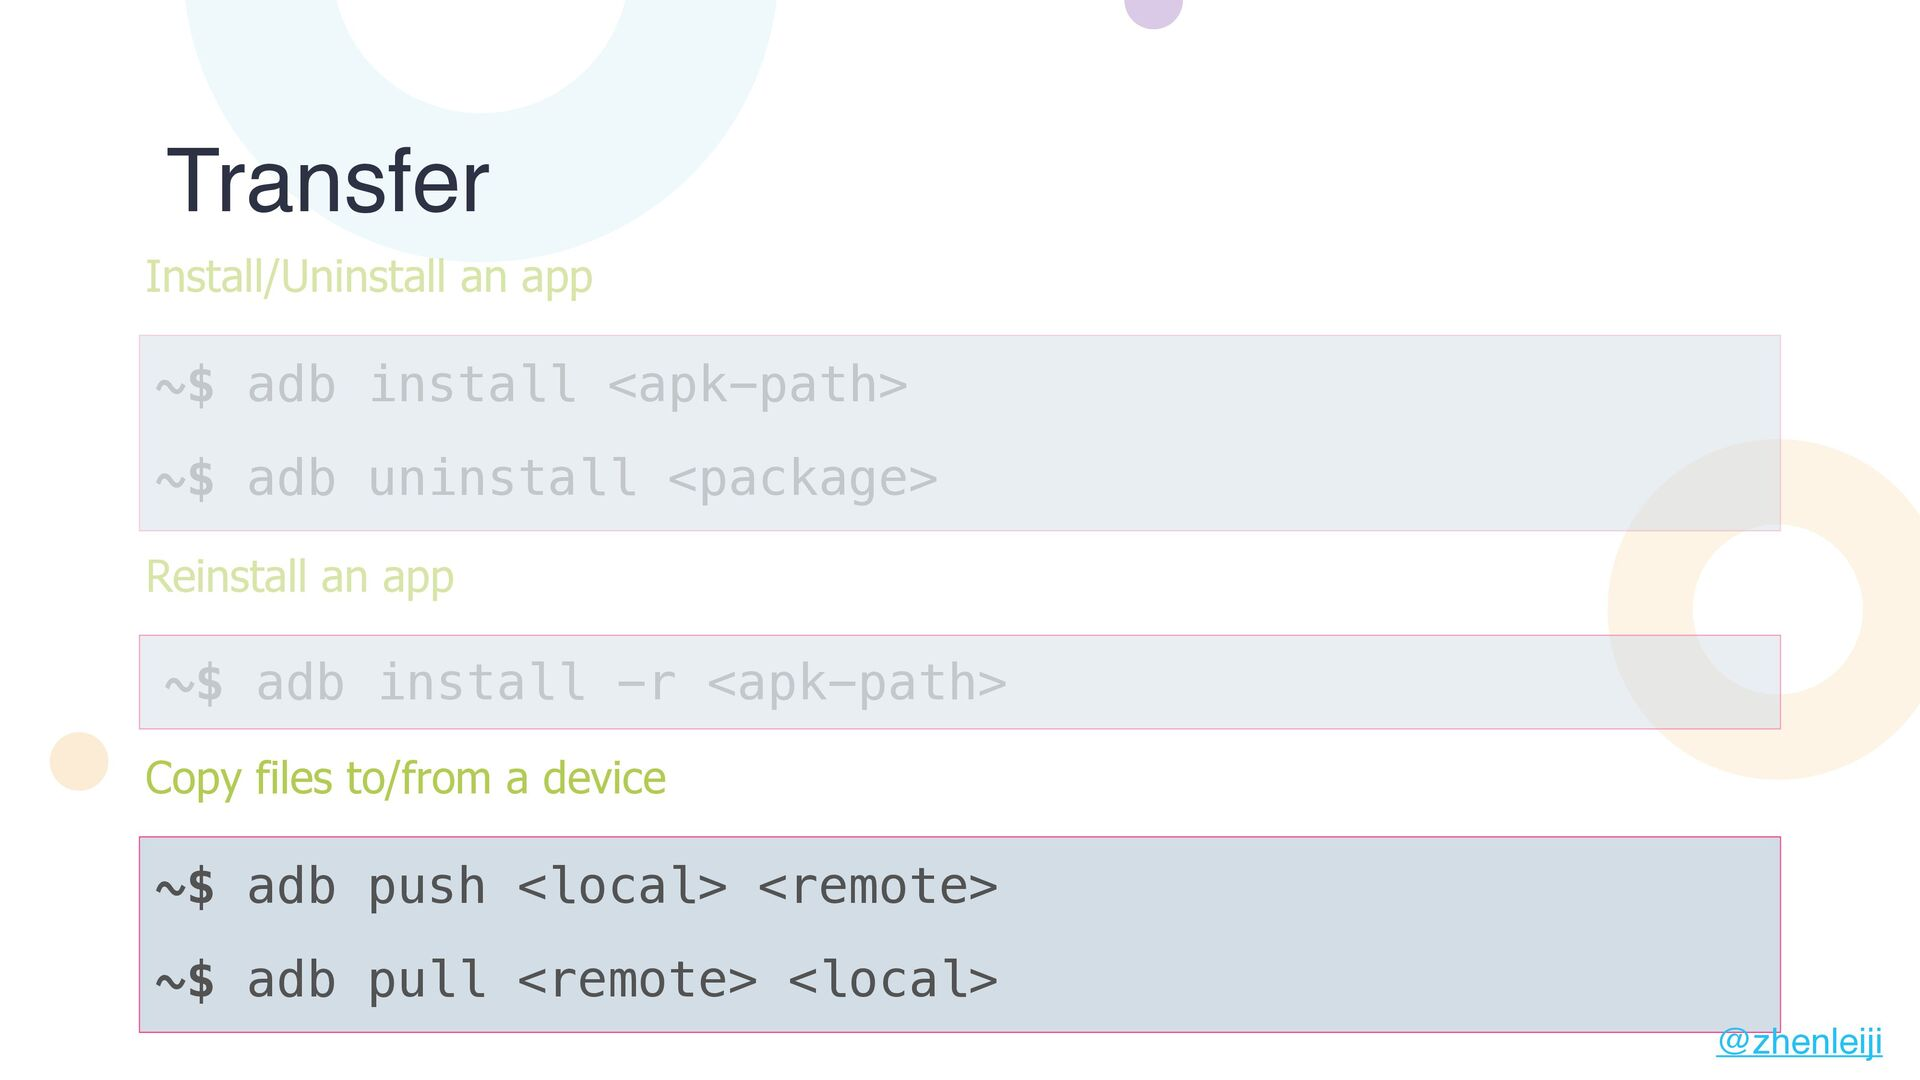 Transfer ~$ adb install <apk-path> Install/Unin...